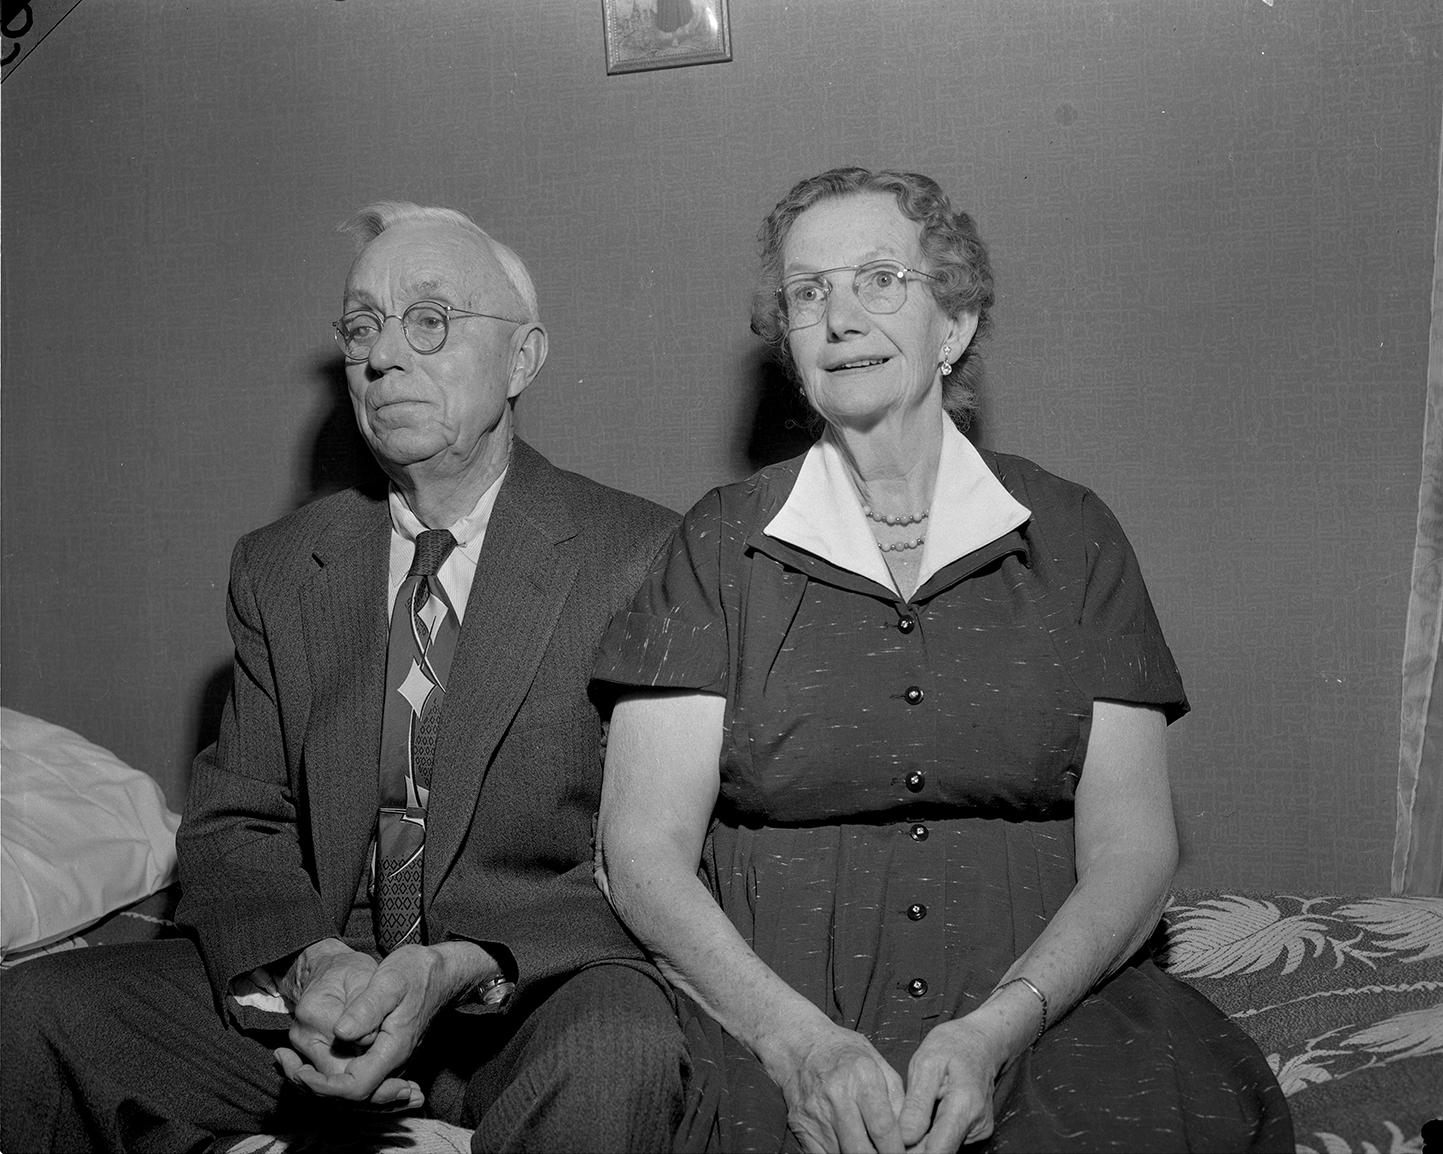 Dec. 9, 1955